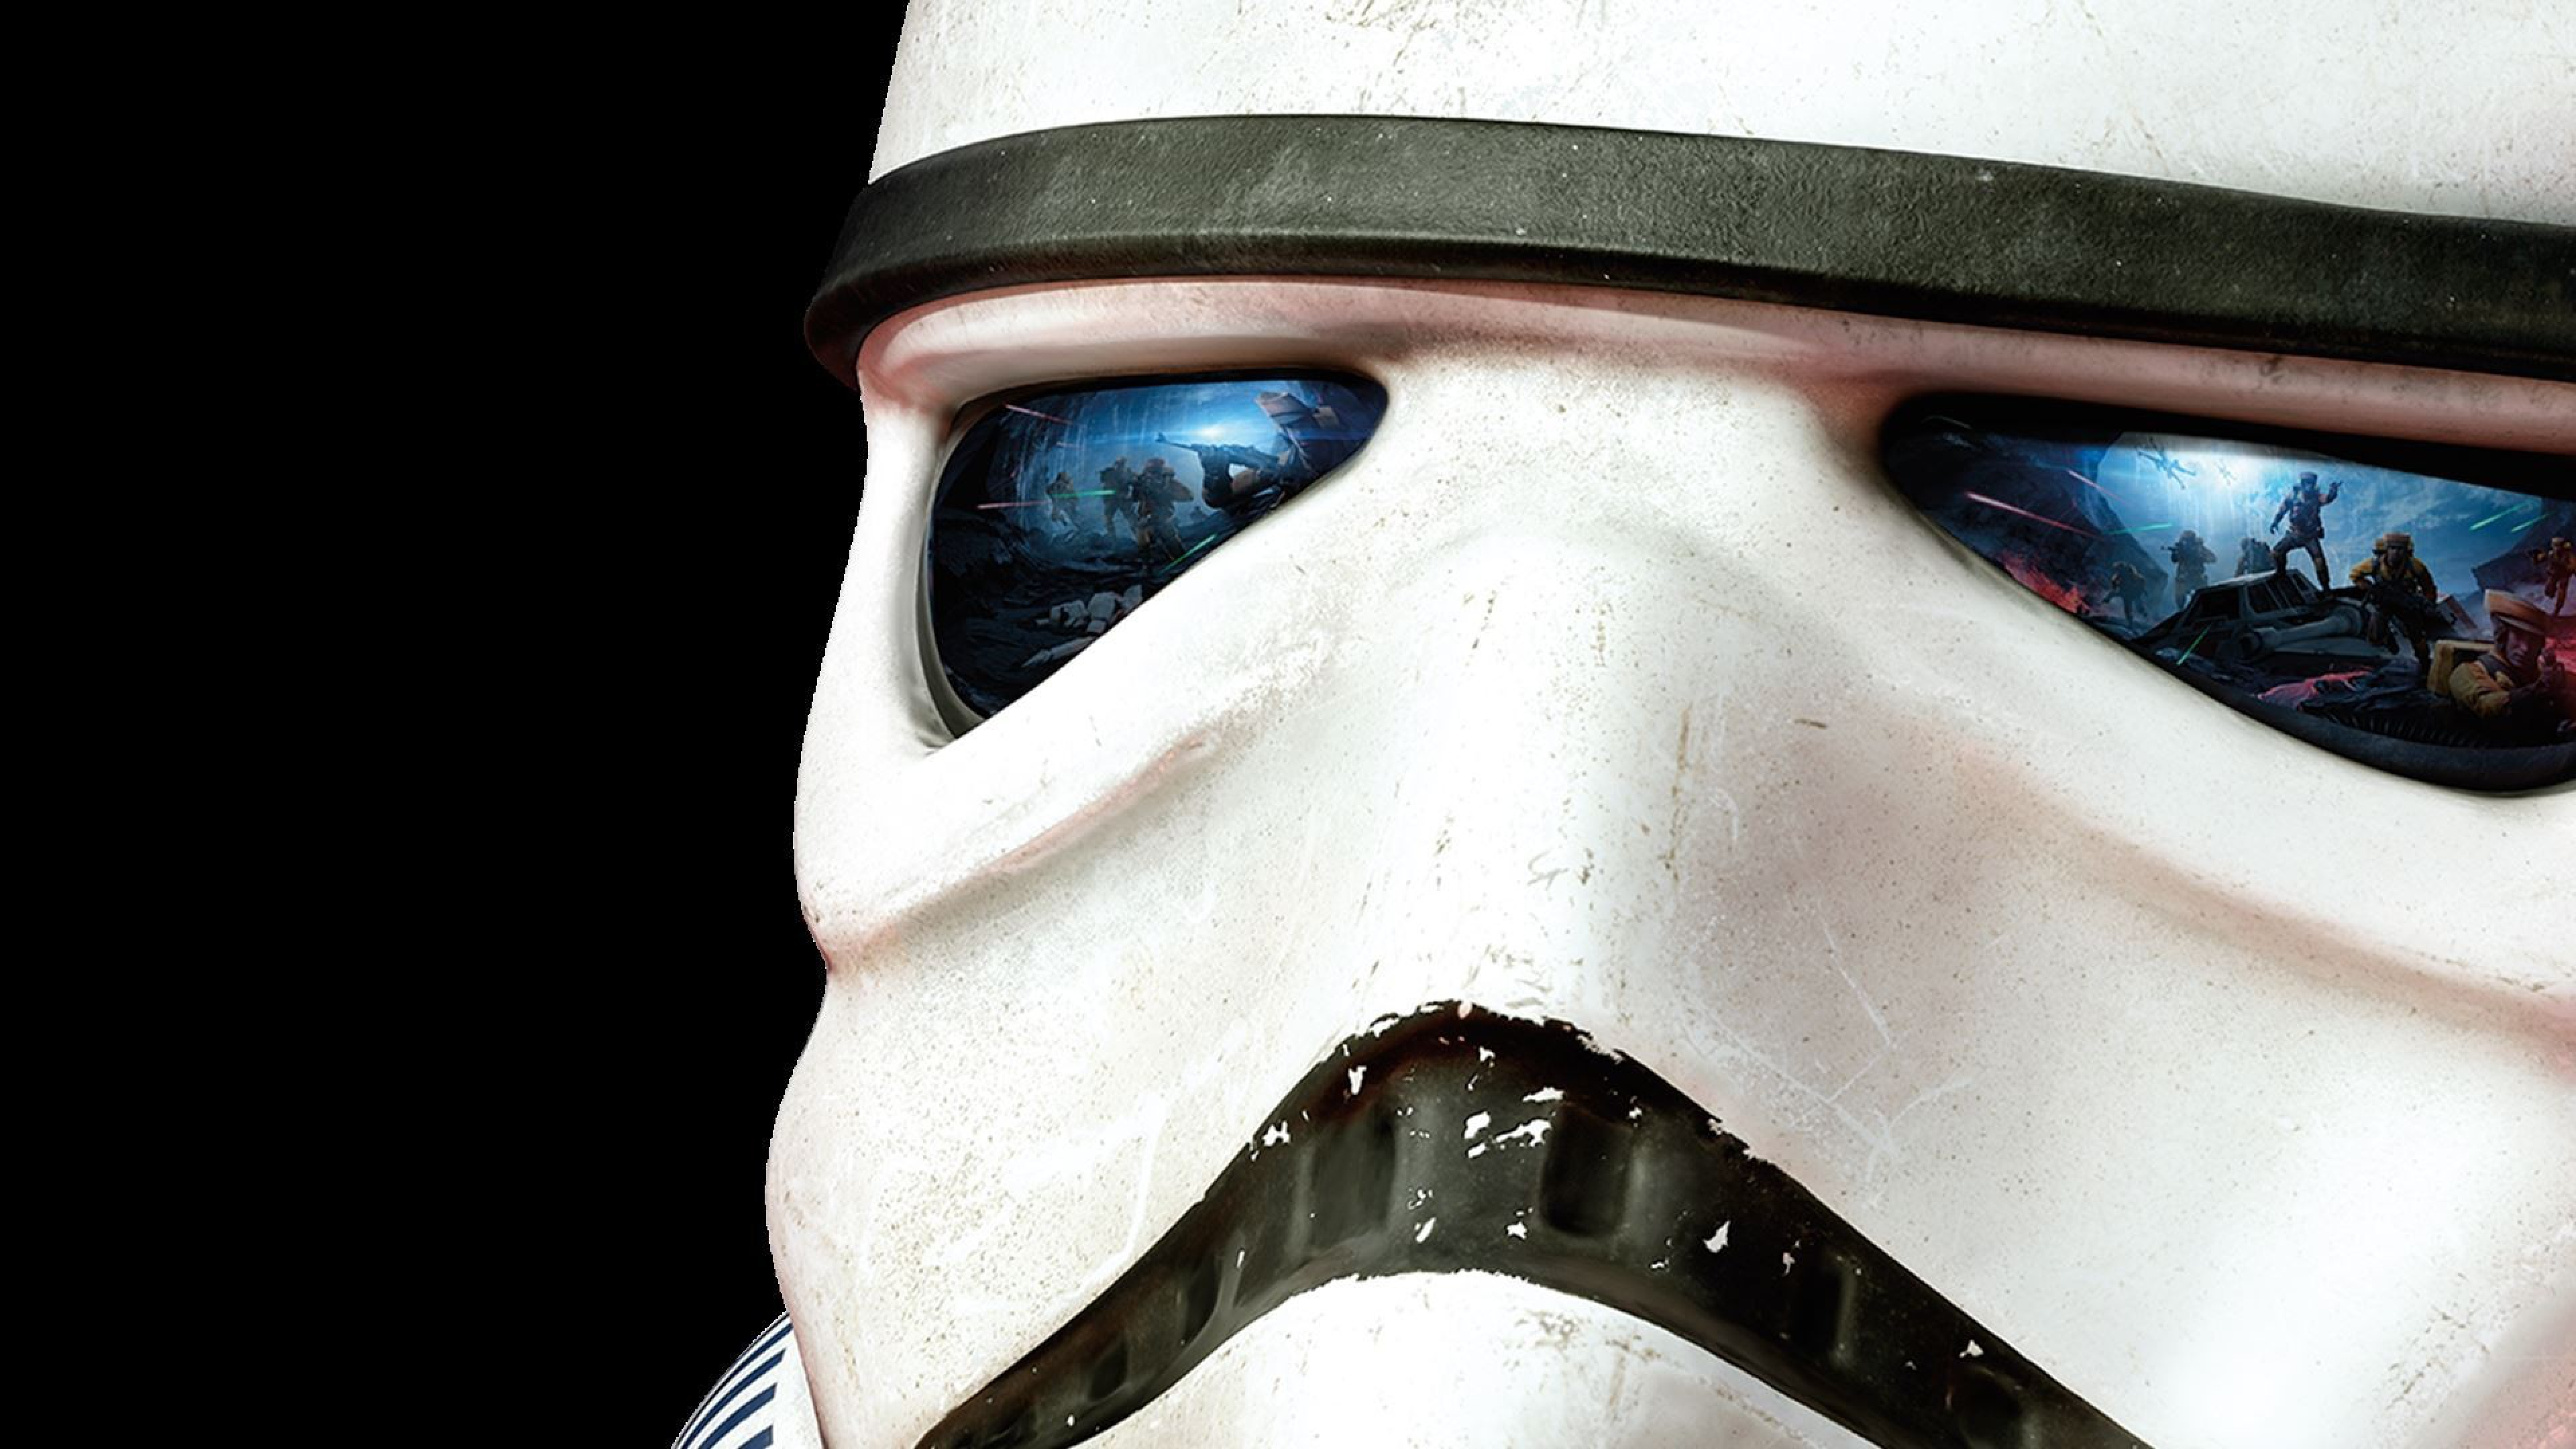 Star wars battlefront 4k wallpaper wallpapersafari - 4k star wars wallpaper ...